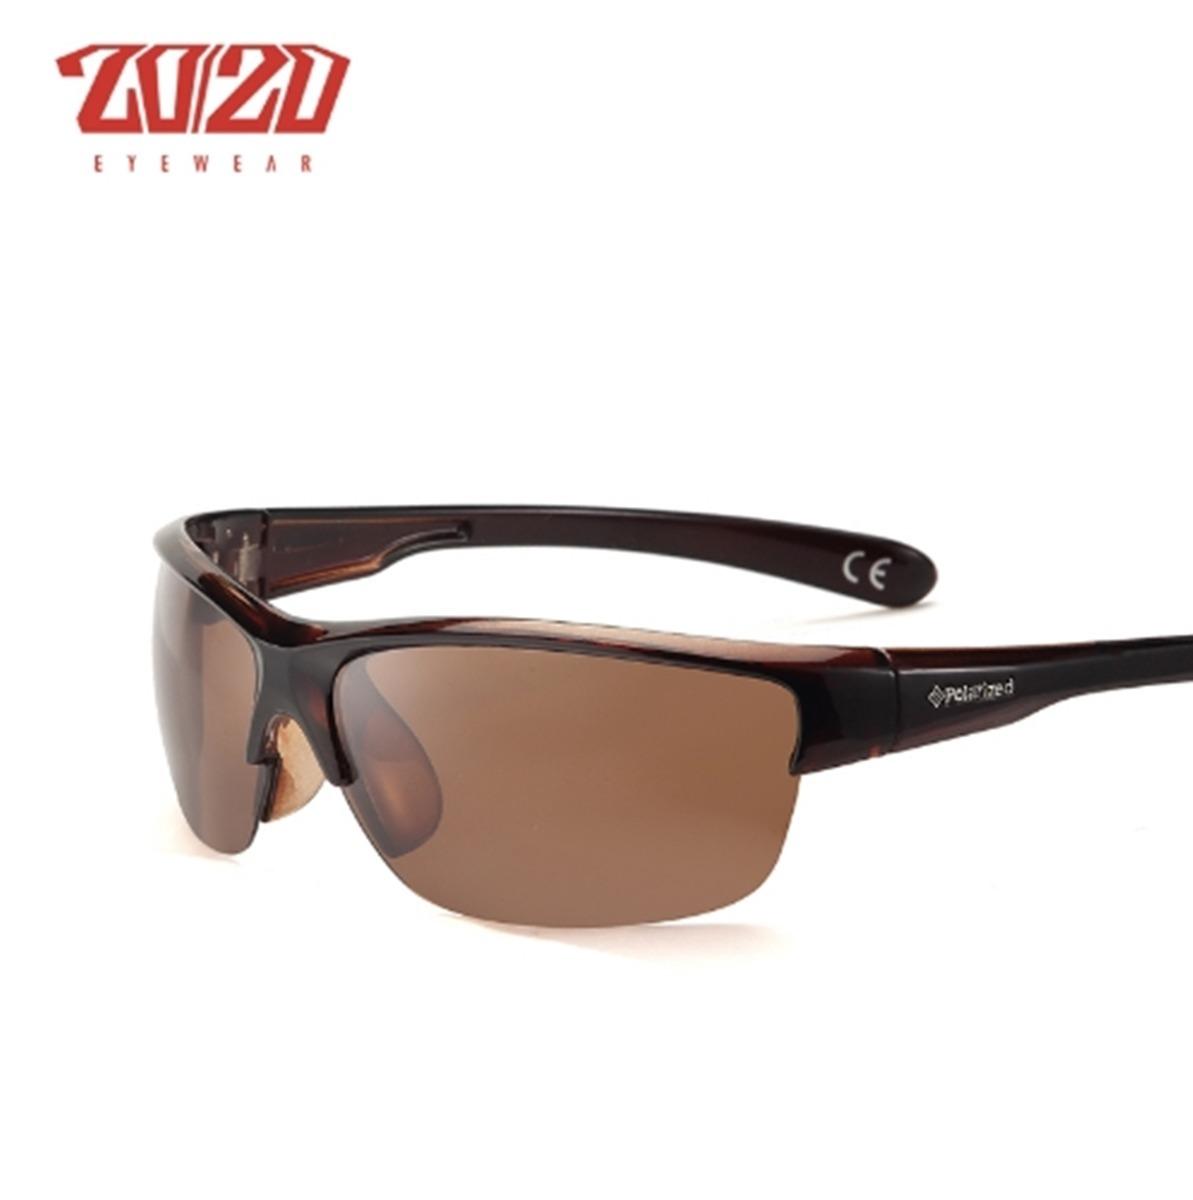 e67e18b4237ce óculos sol masculino polarizado uv400 20 20 pl289 barato. Carregando zoom.